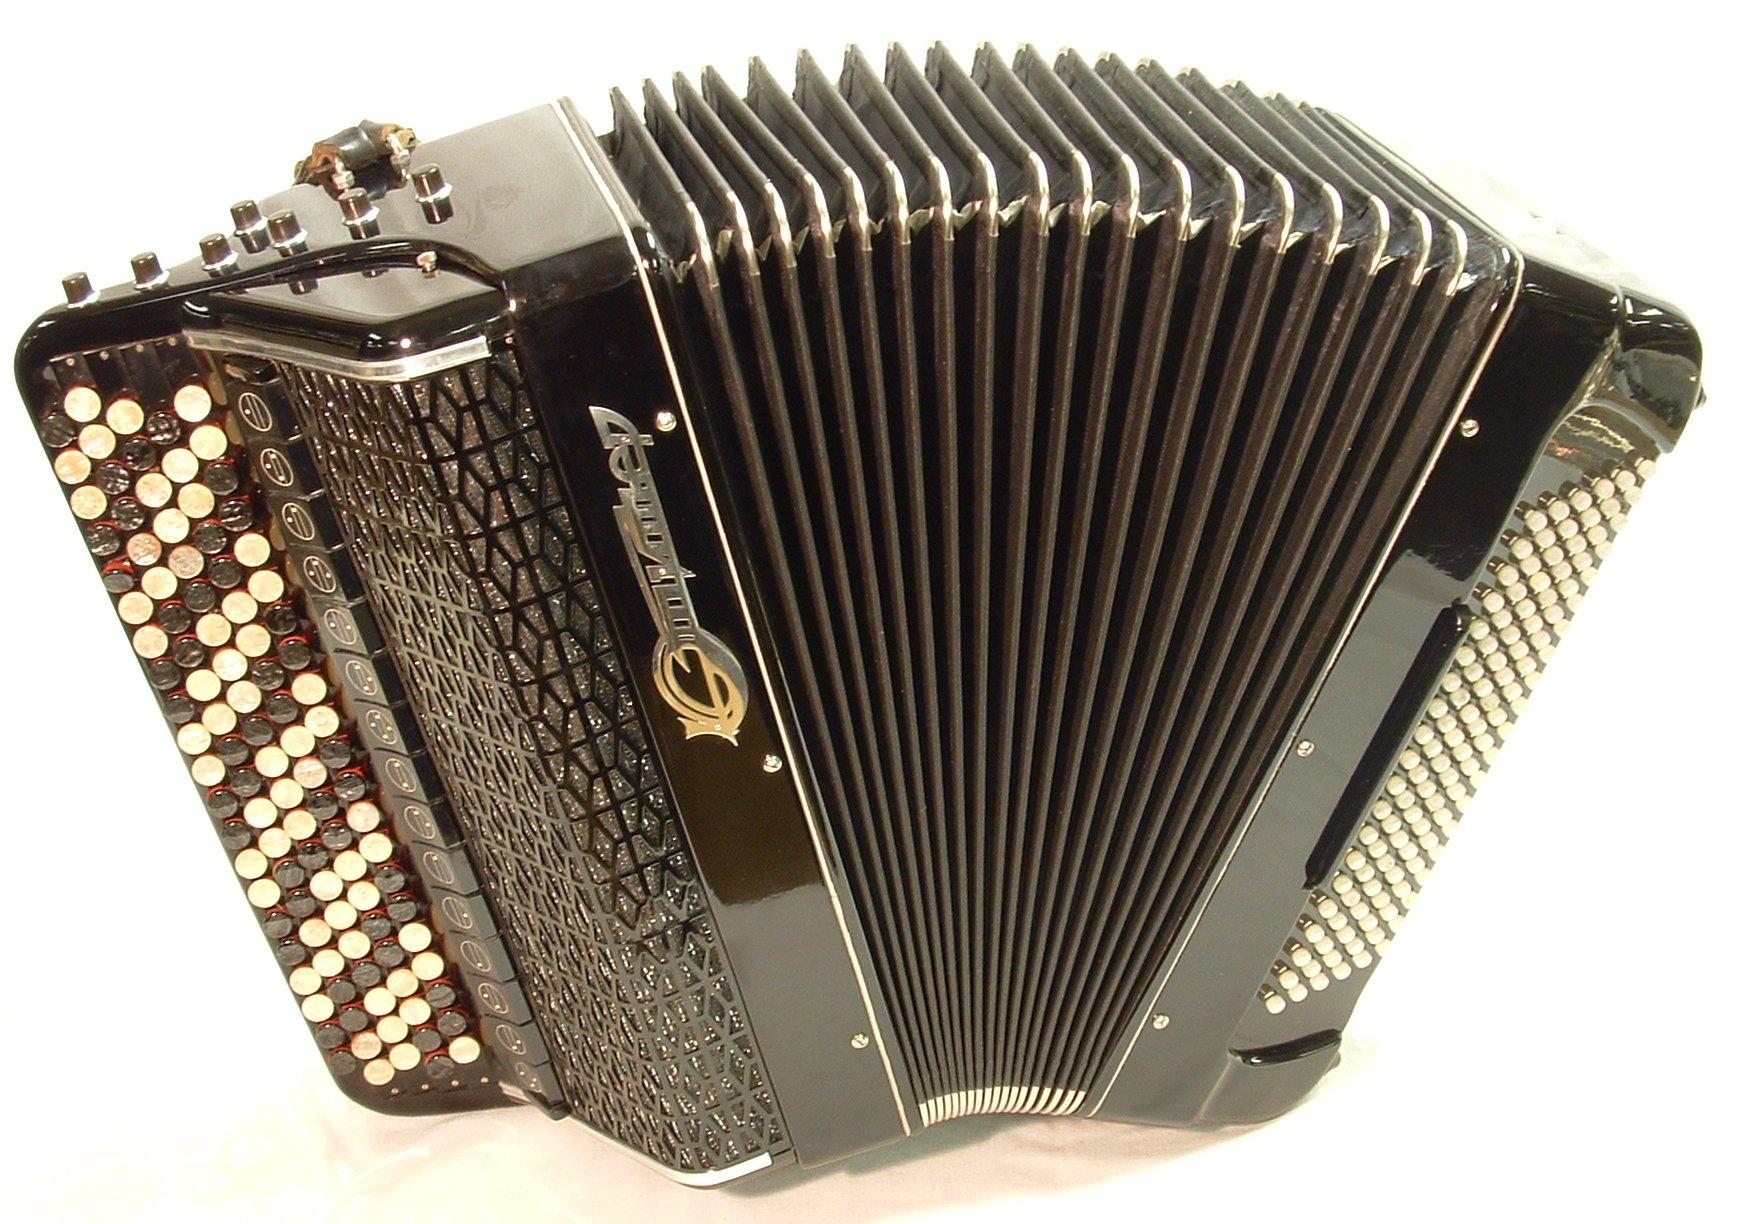 File:Jupiter bayan accordion.JPG - Wikipedia, the free encyclopedia: en.wikipedia.org/wiki/File:Jupiter_bayan_accordion.JPG